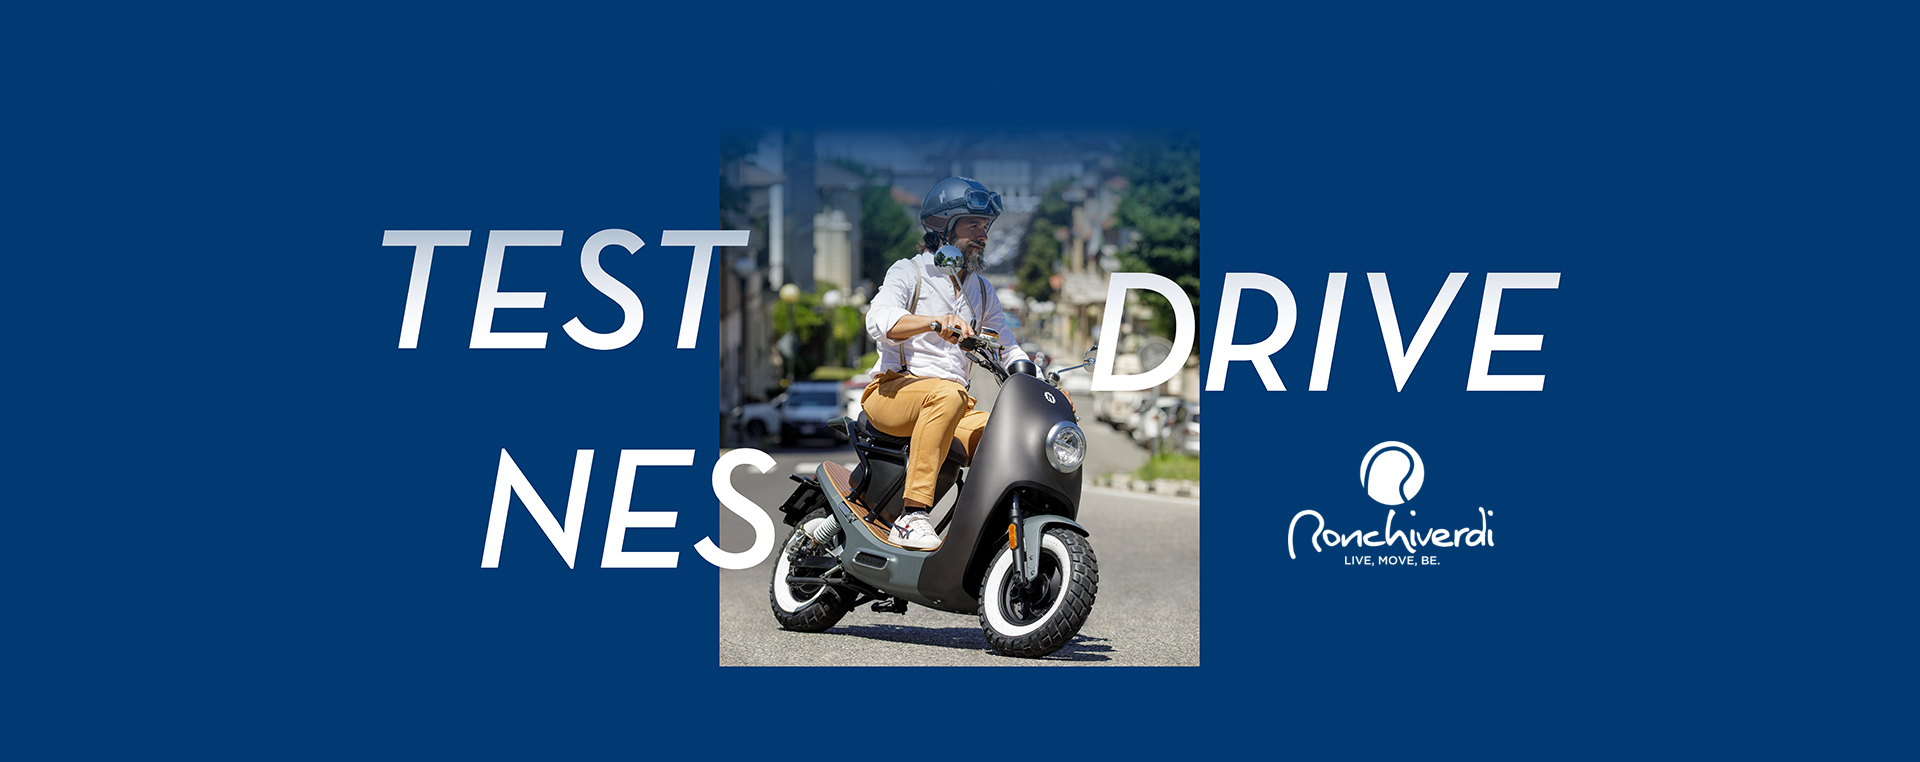 test drive ronchi seconda pagina news